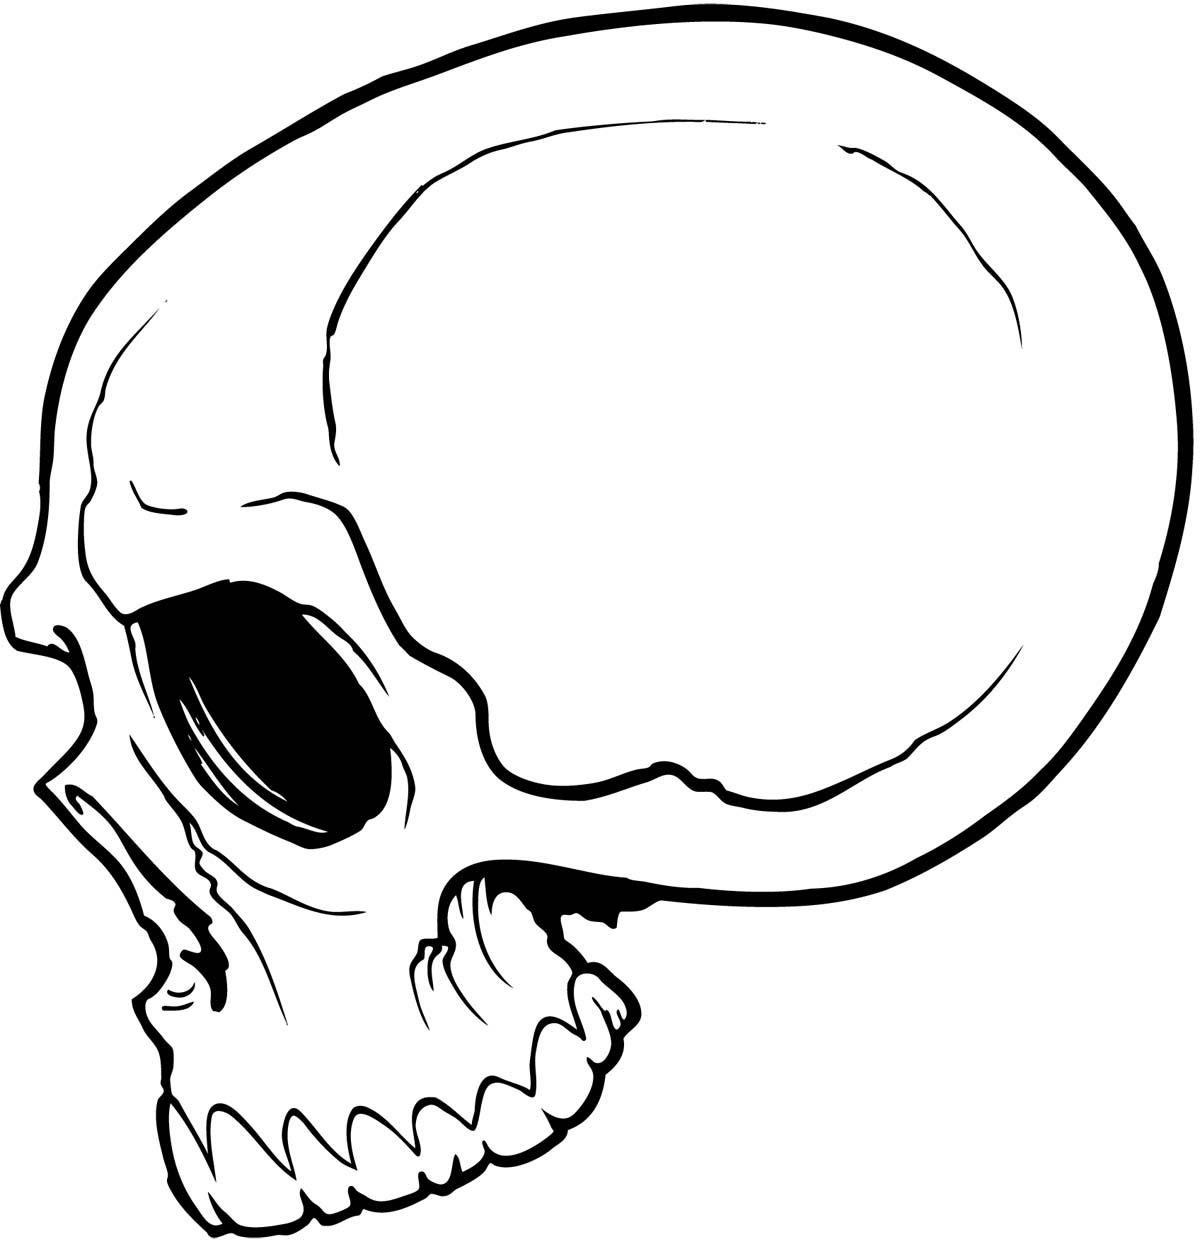 Free Simple Skull Tattoos Designs Download Free Clip Art Free Clip